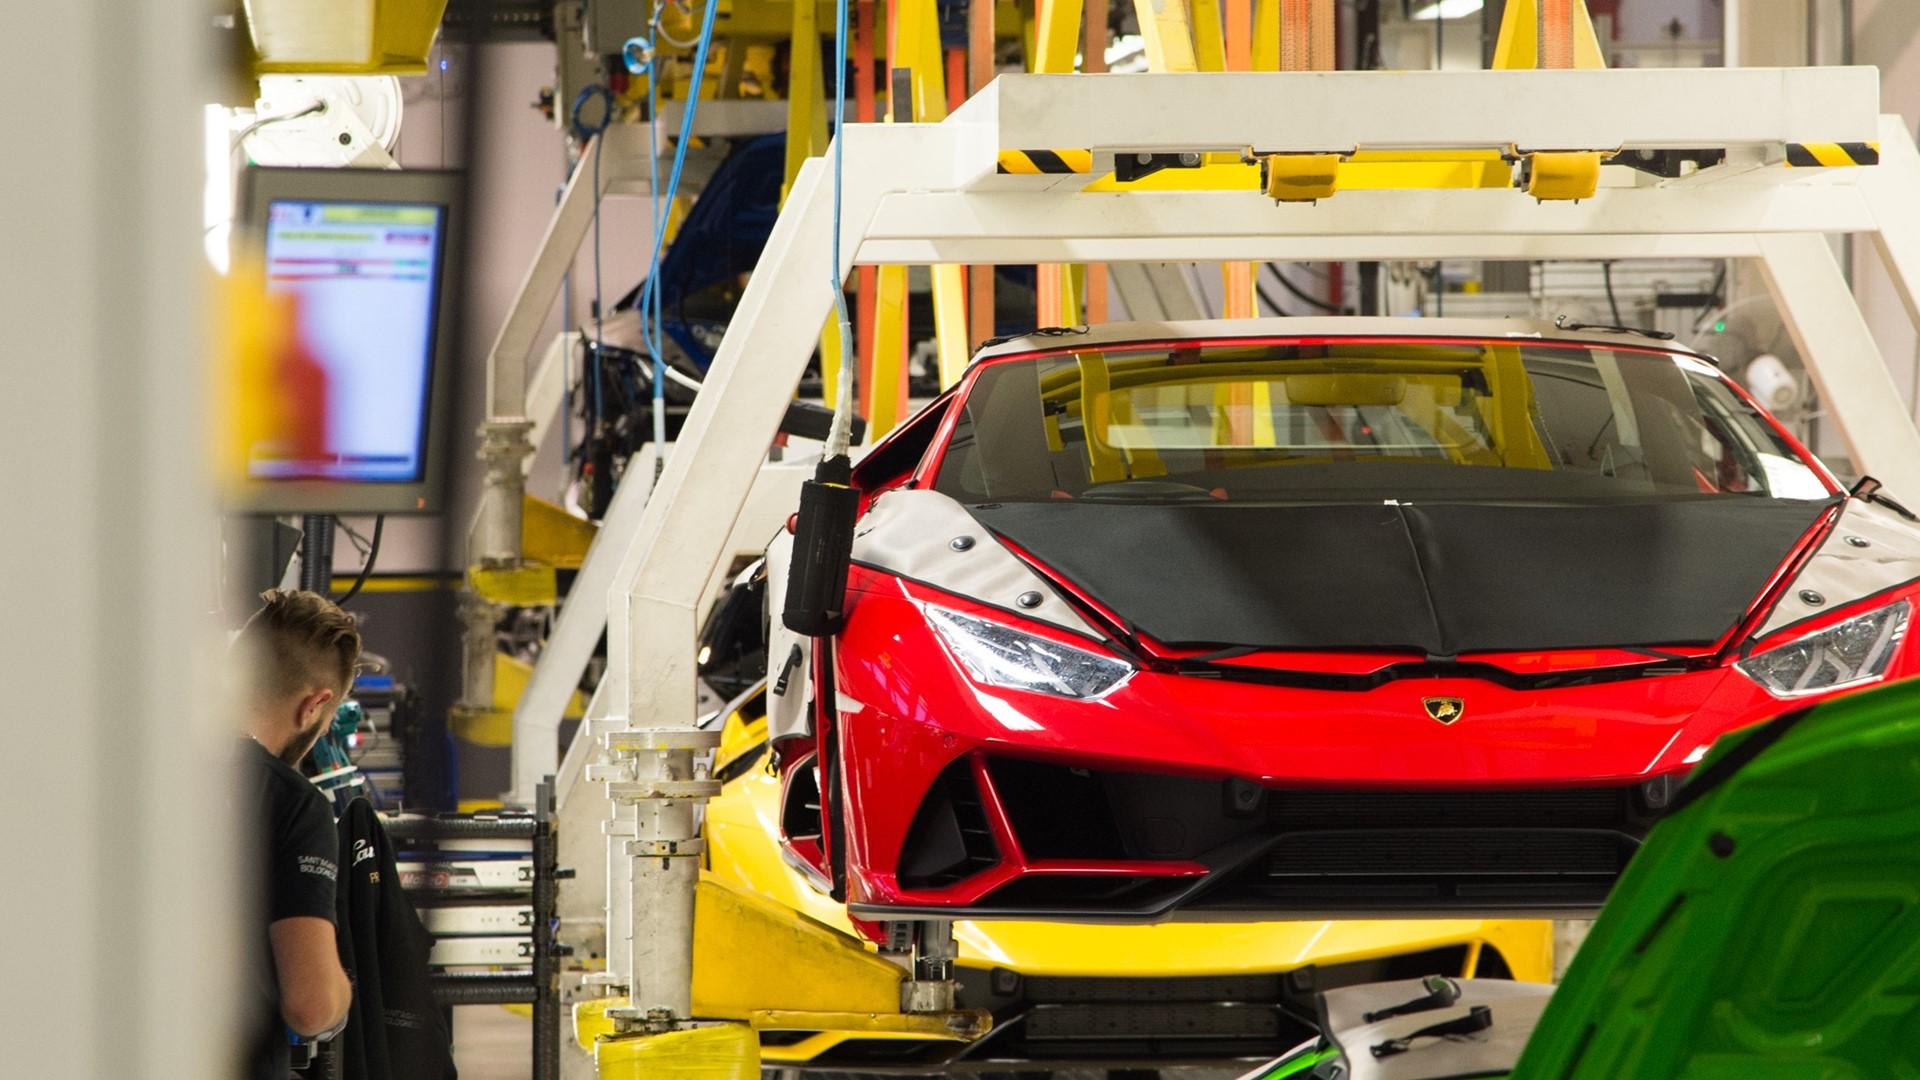 Lamborghini Christmas Drive: a holiday journey with Aventador SVJ, Huracán EVO and Urus celebrates a successful 2019 - Image 7